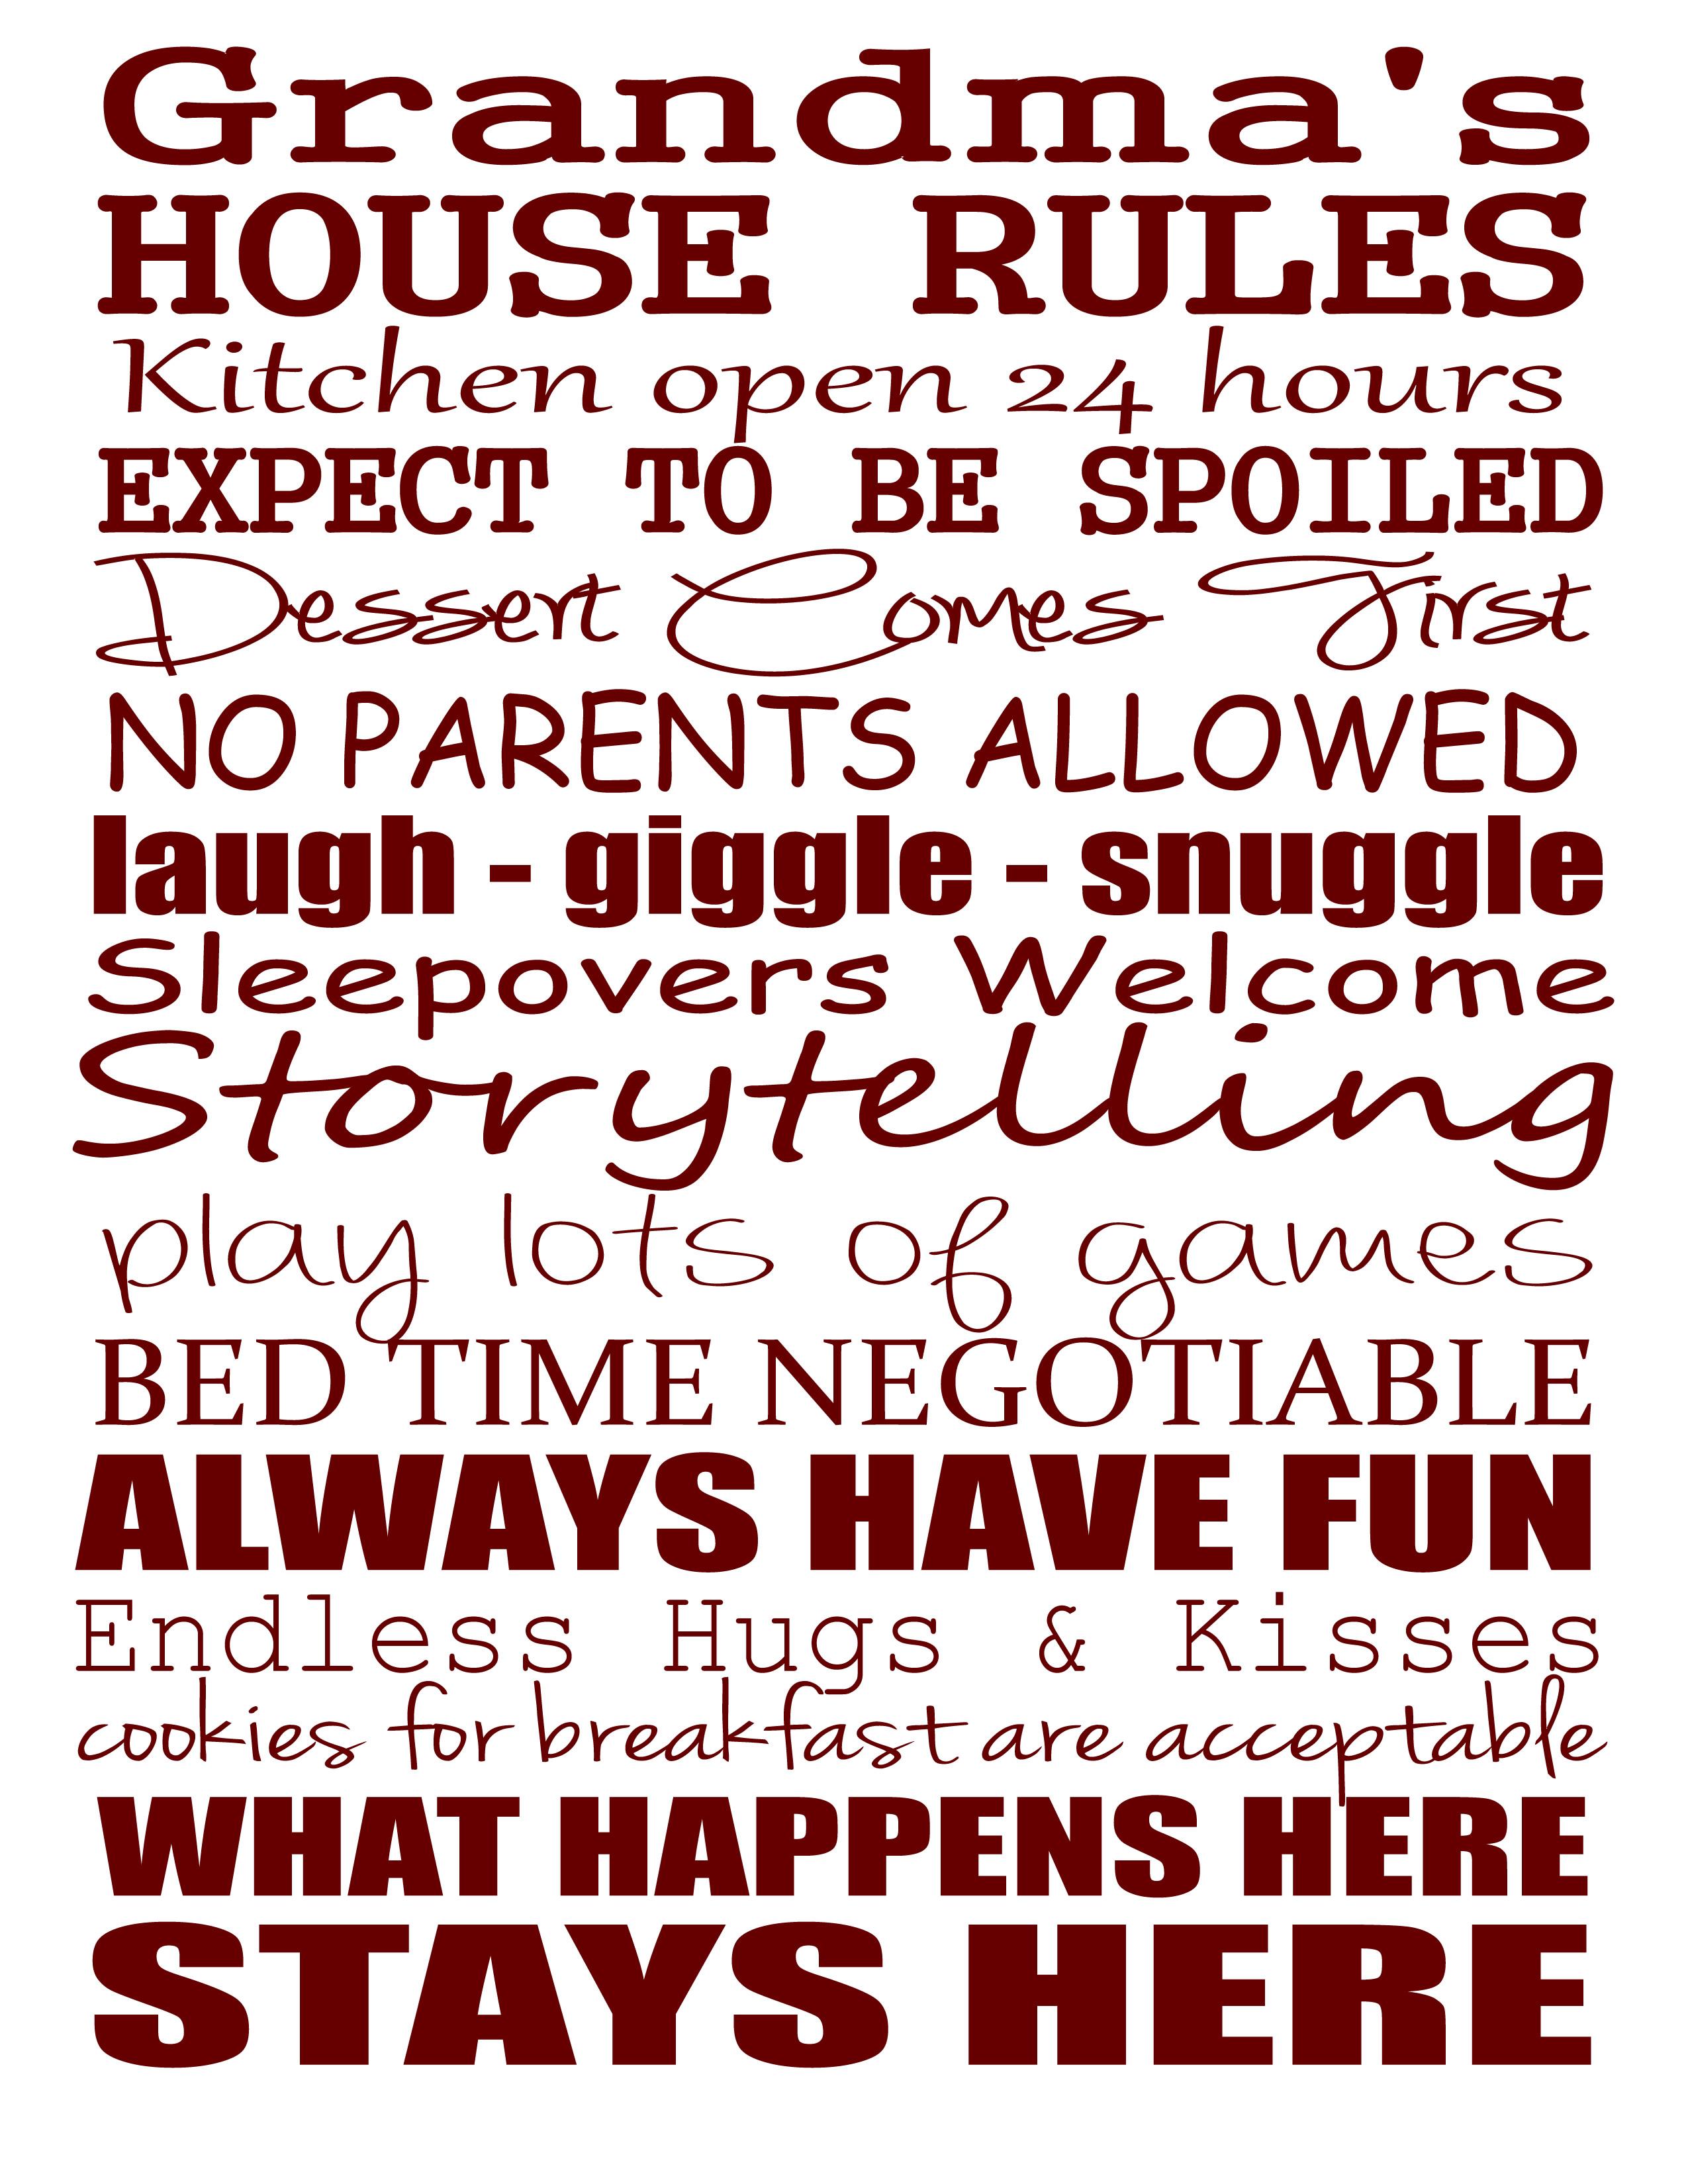 6 Images of Grandma House Rules Printable